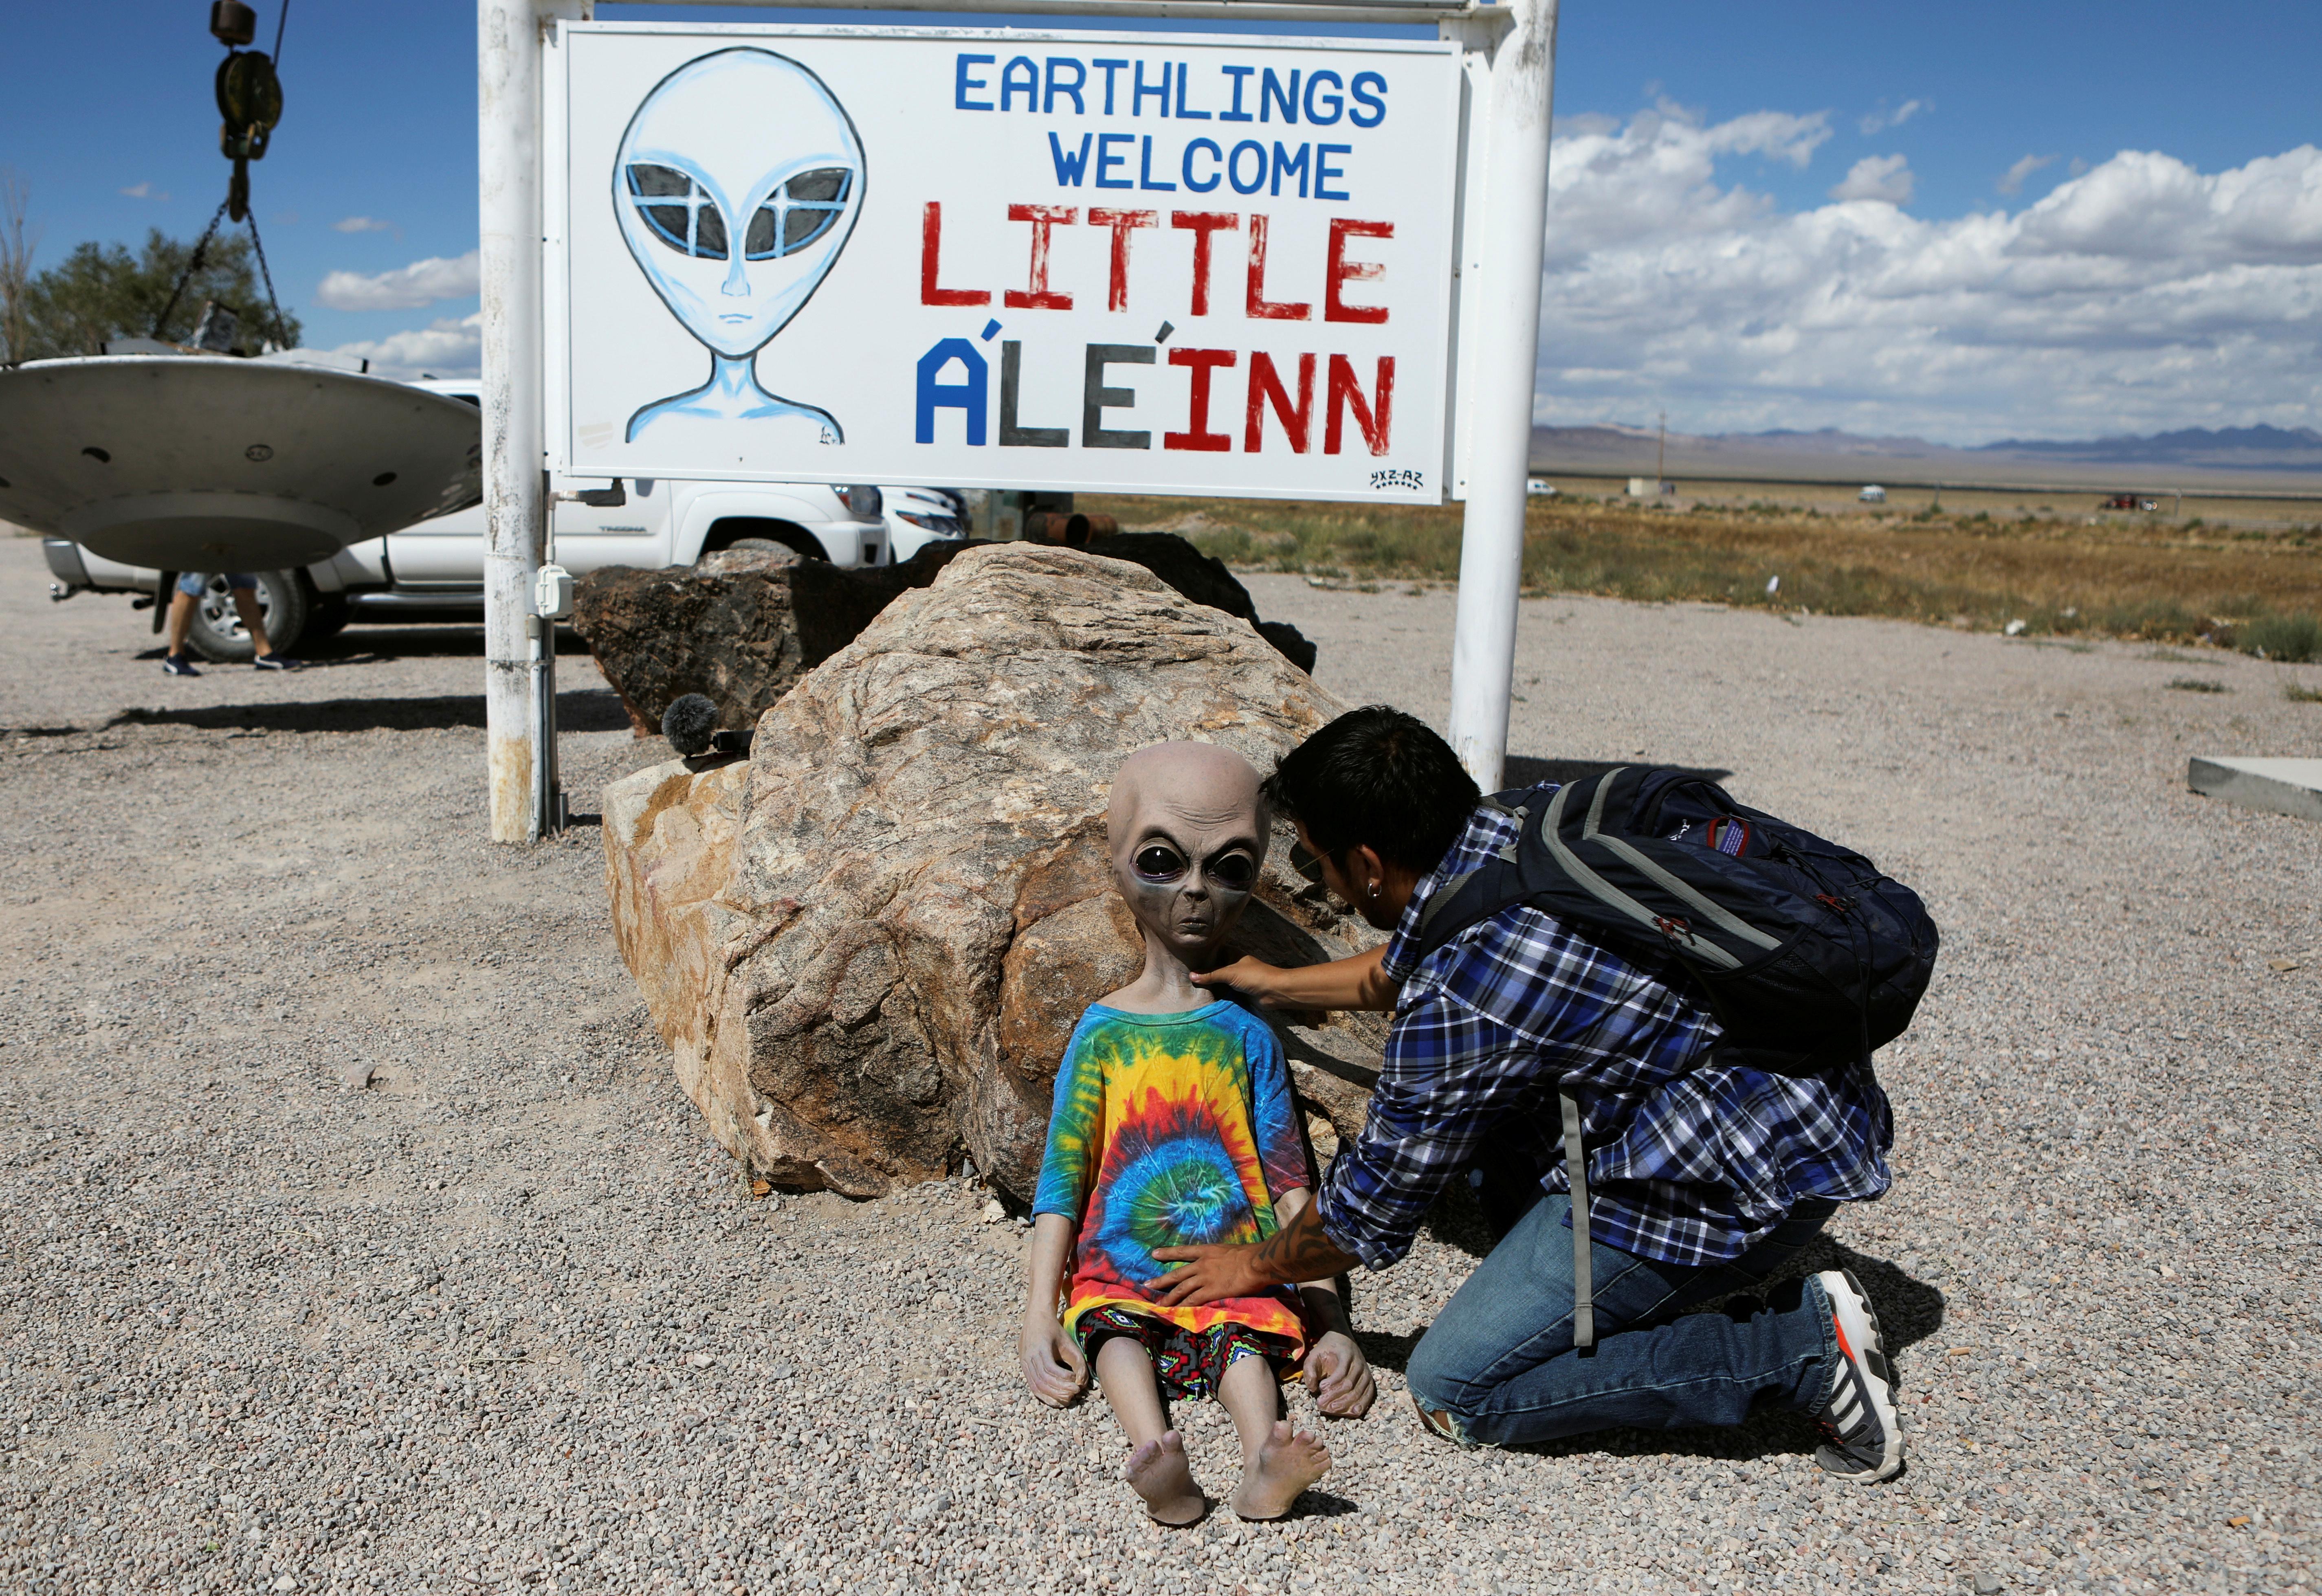 Alien enthusiasts descend on Nevada desert near secretive U.S. base